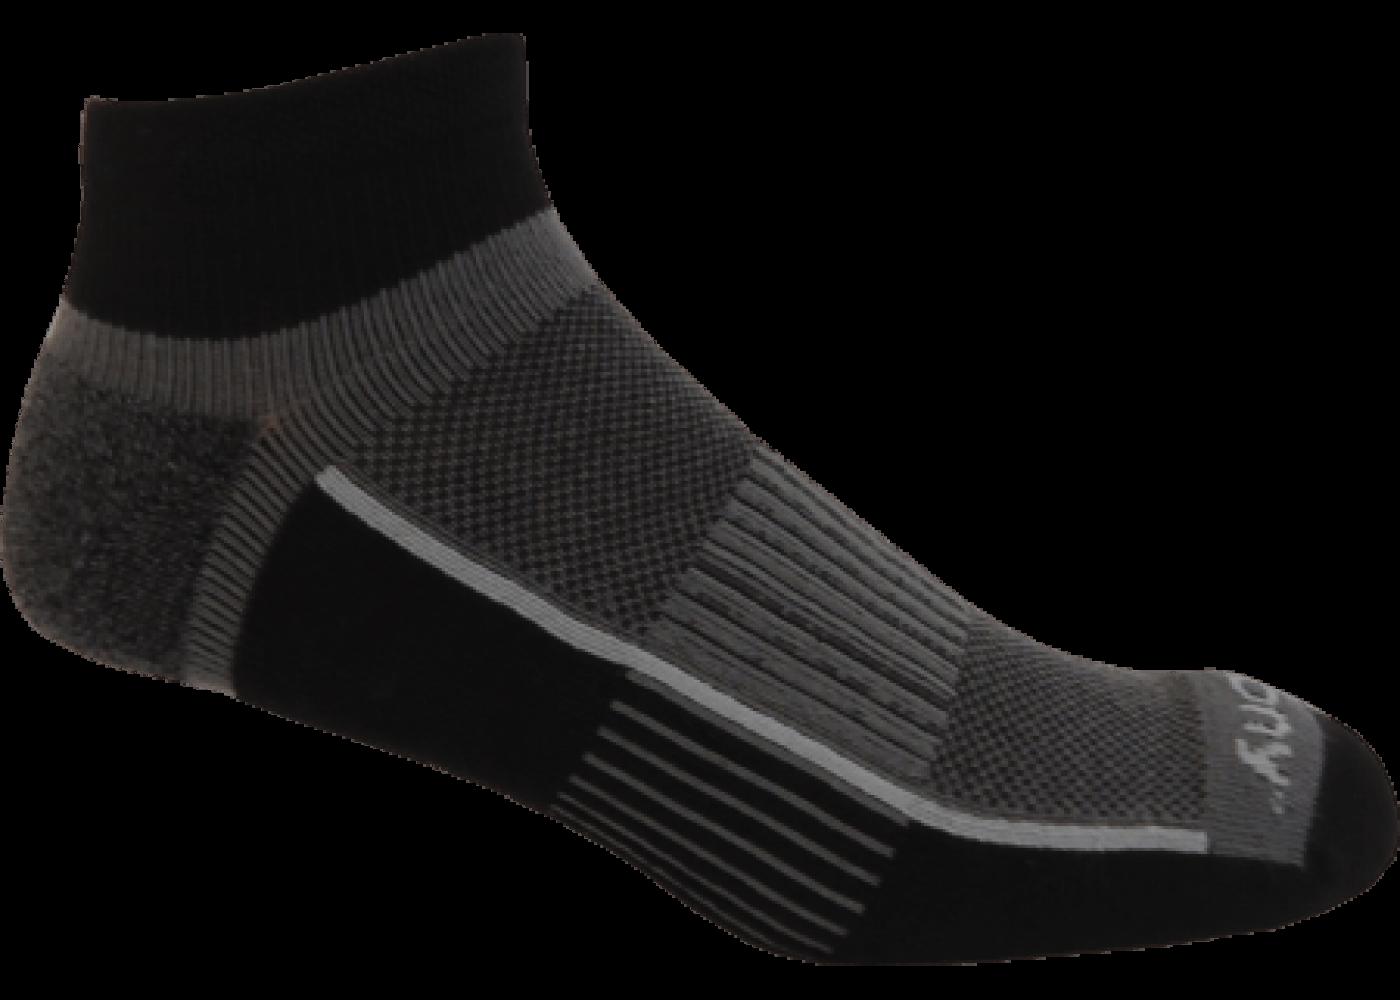 Clipart socks socks nike. Download png image hq